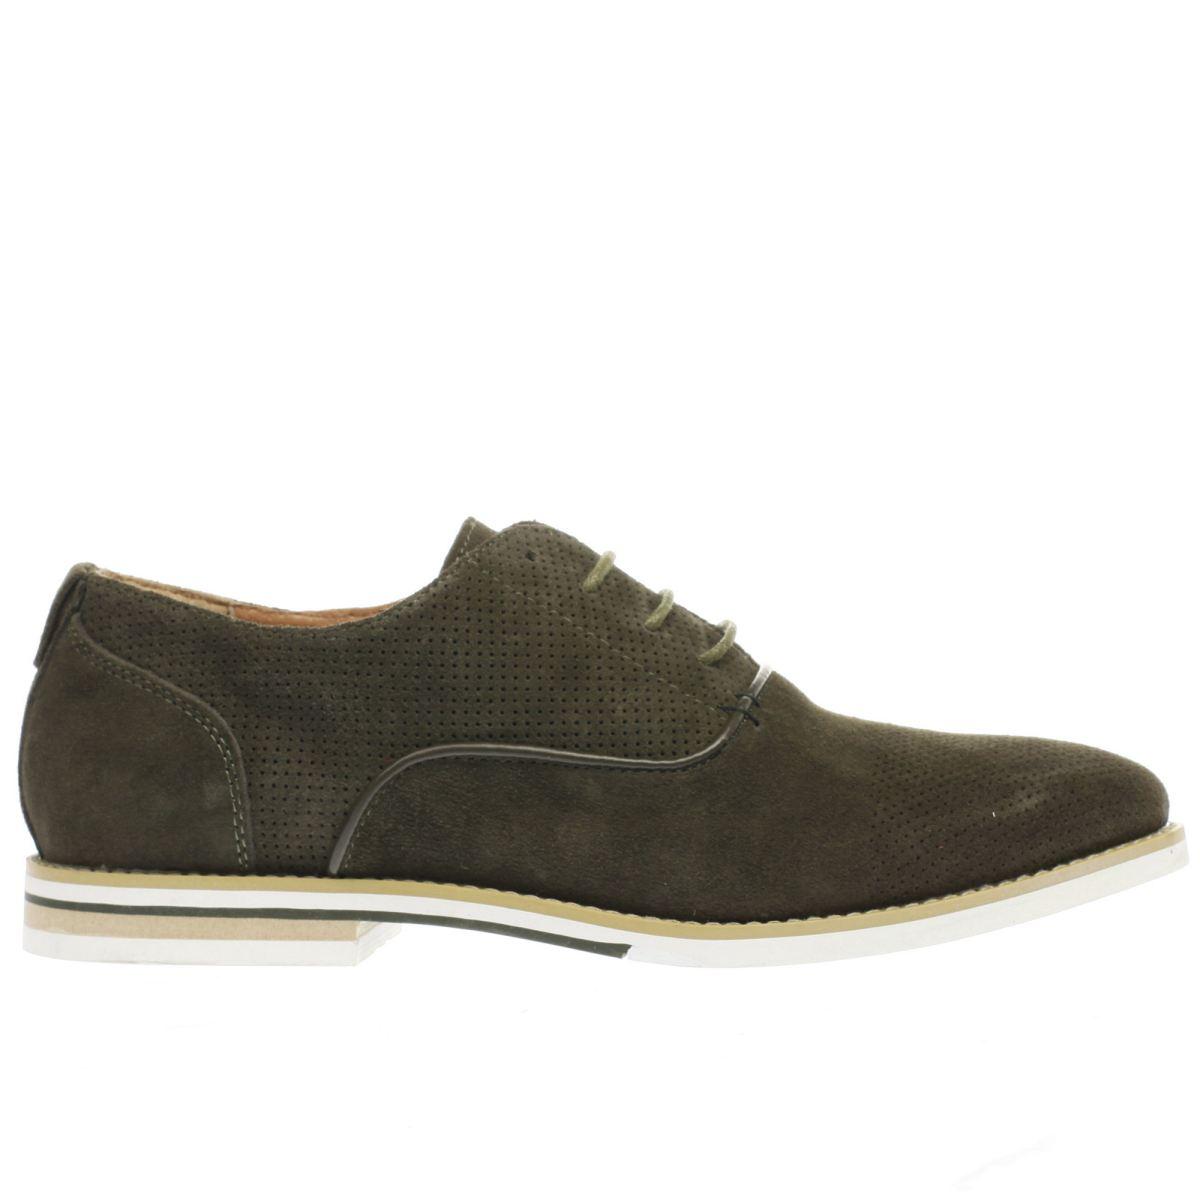 peter werth khaki nesbit oxford perf shoes